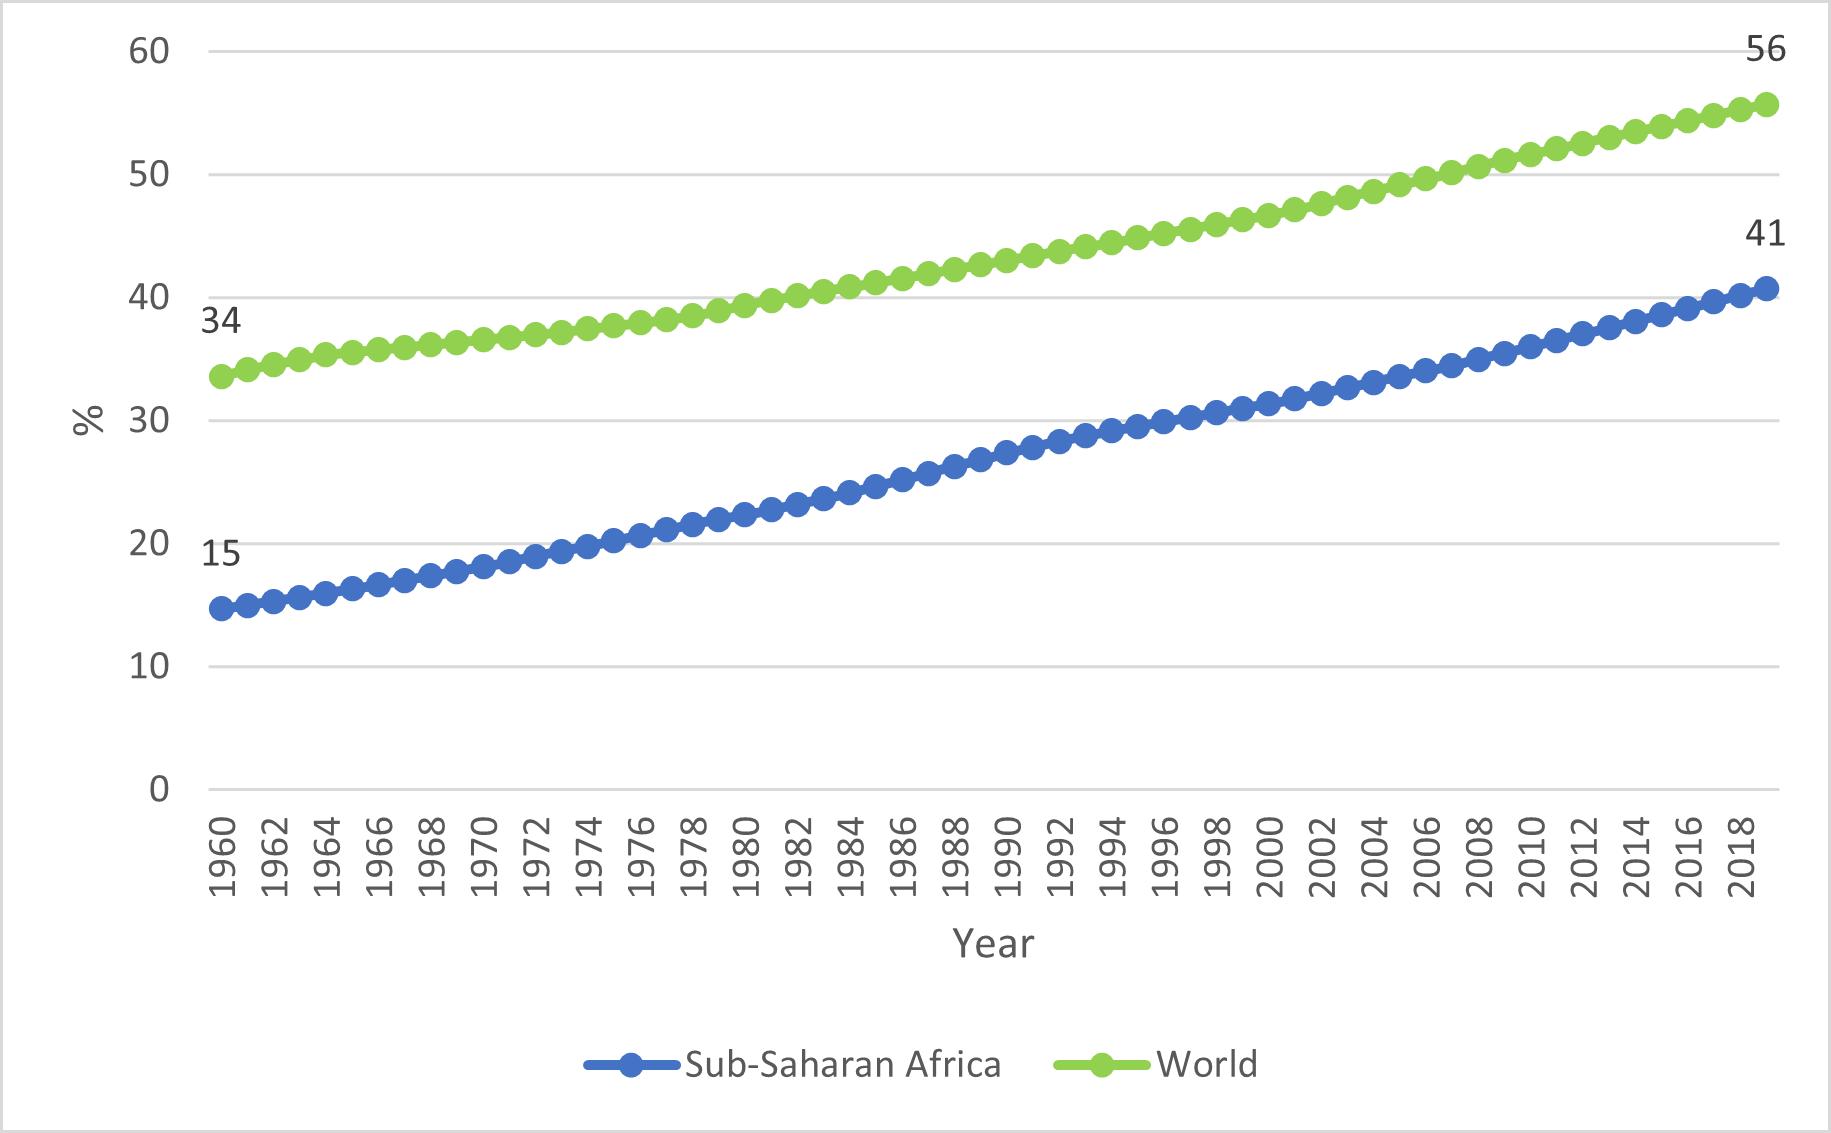 Urban population (% of total population)